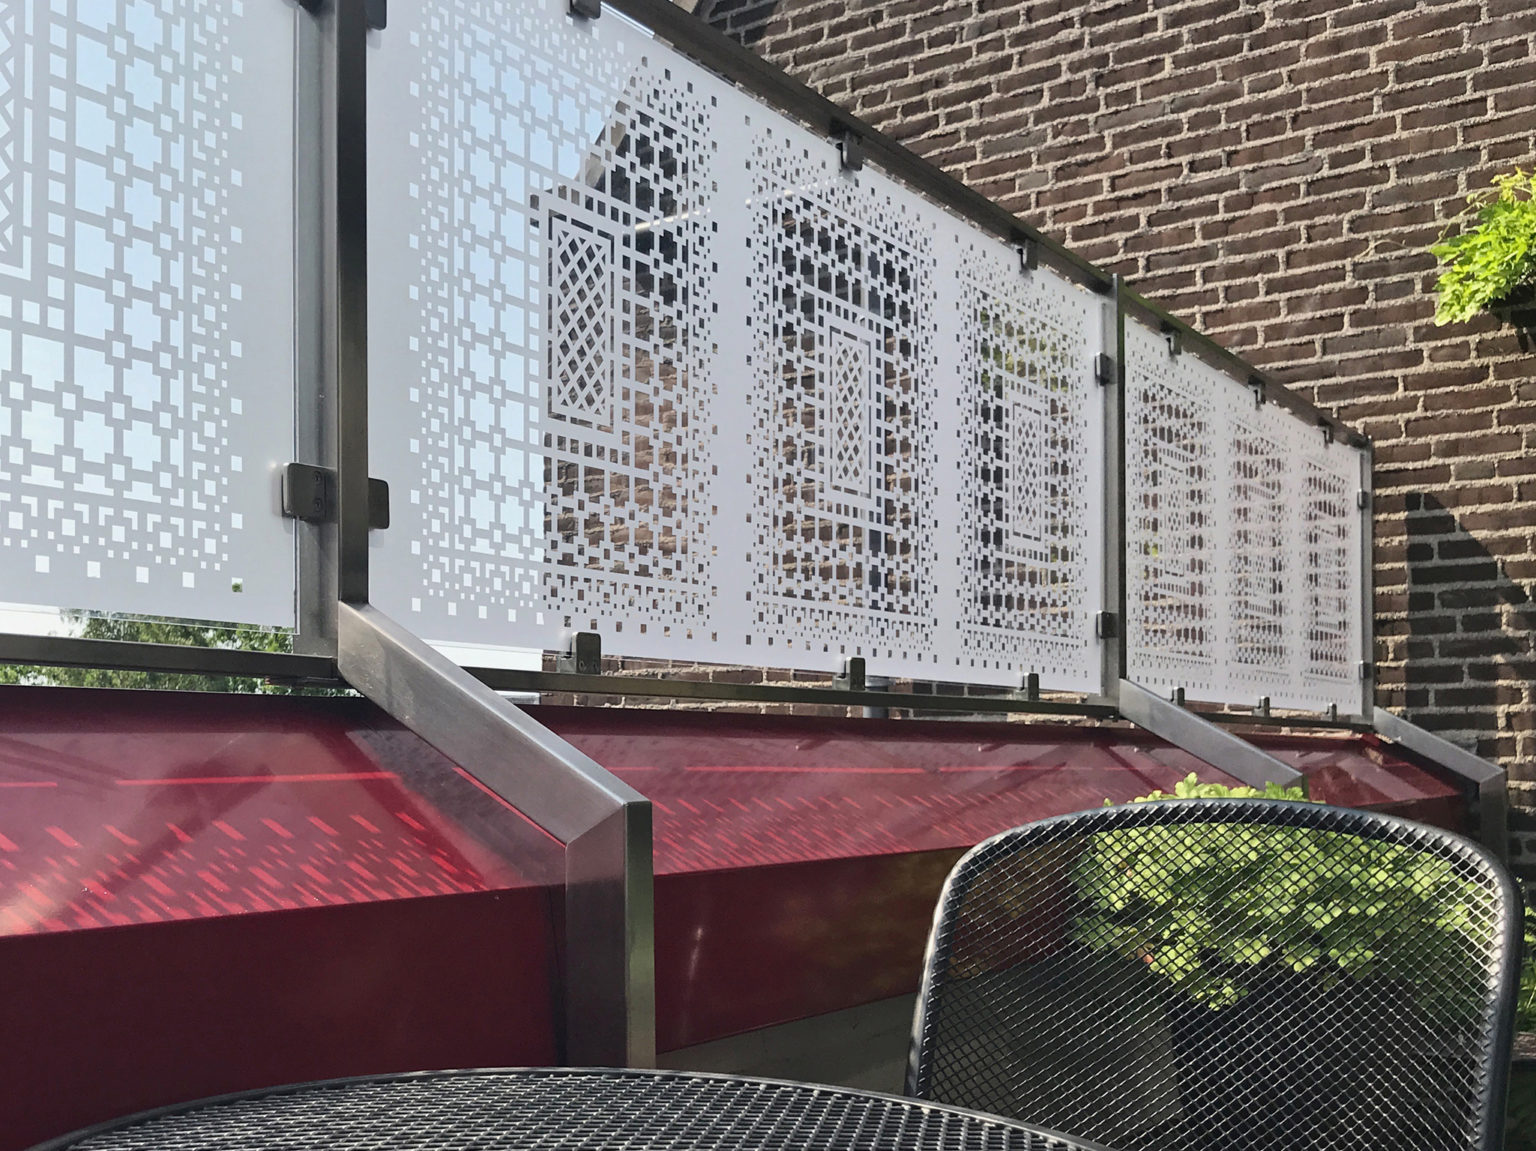 Raamfolie patroon op balkonscherm